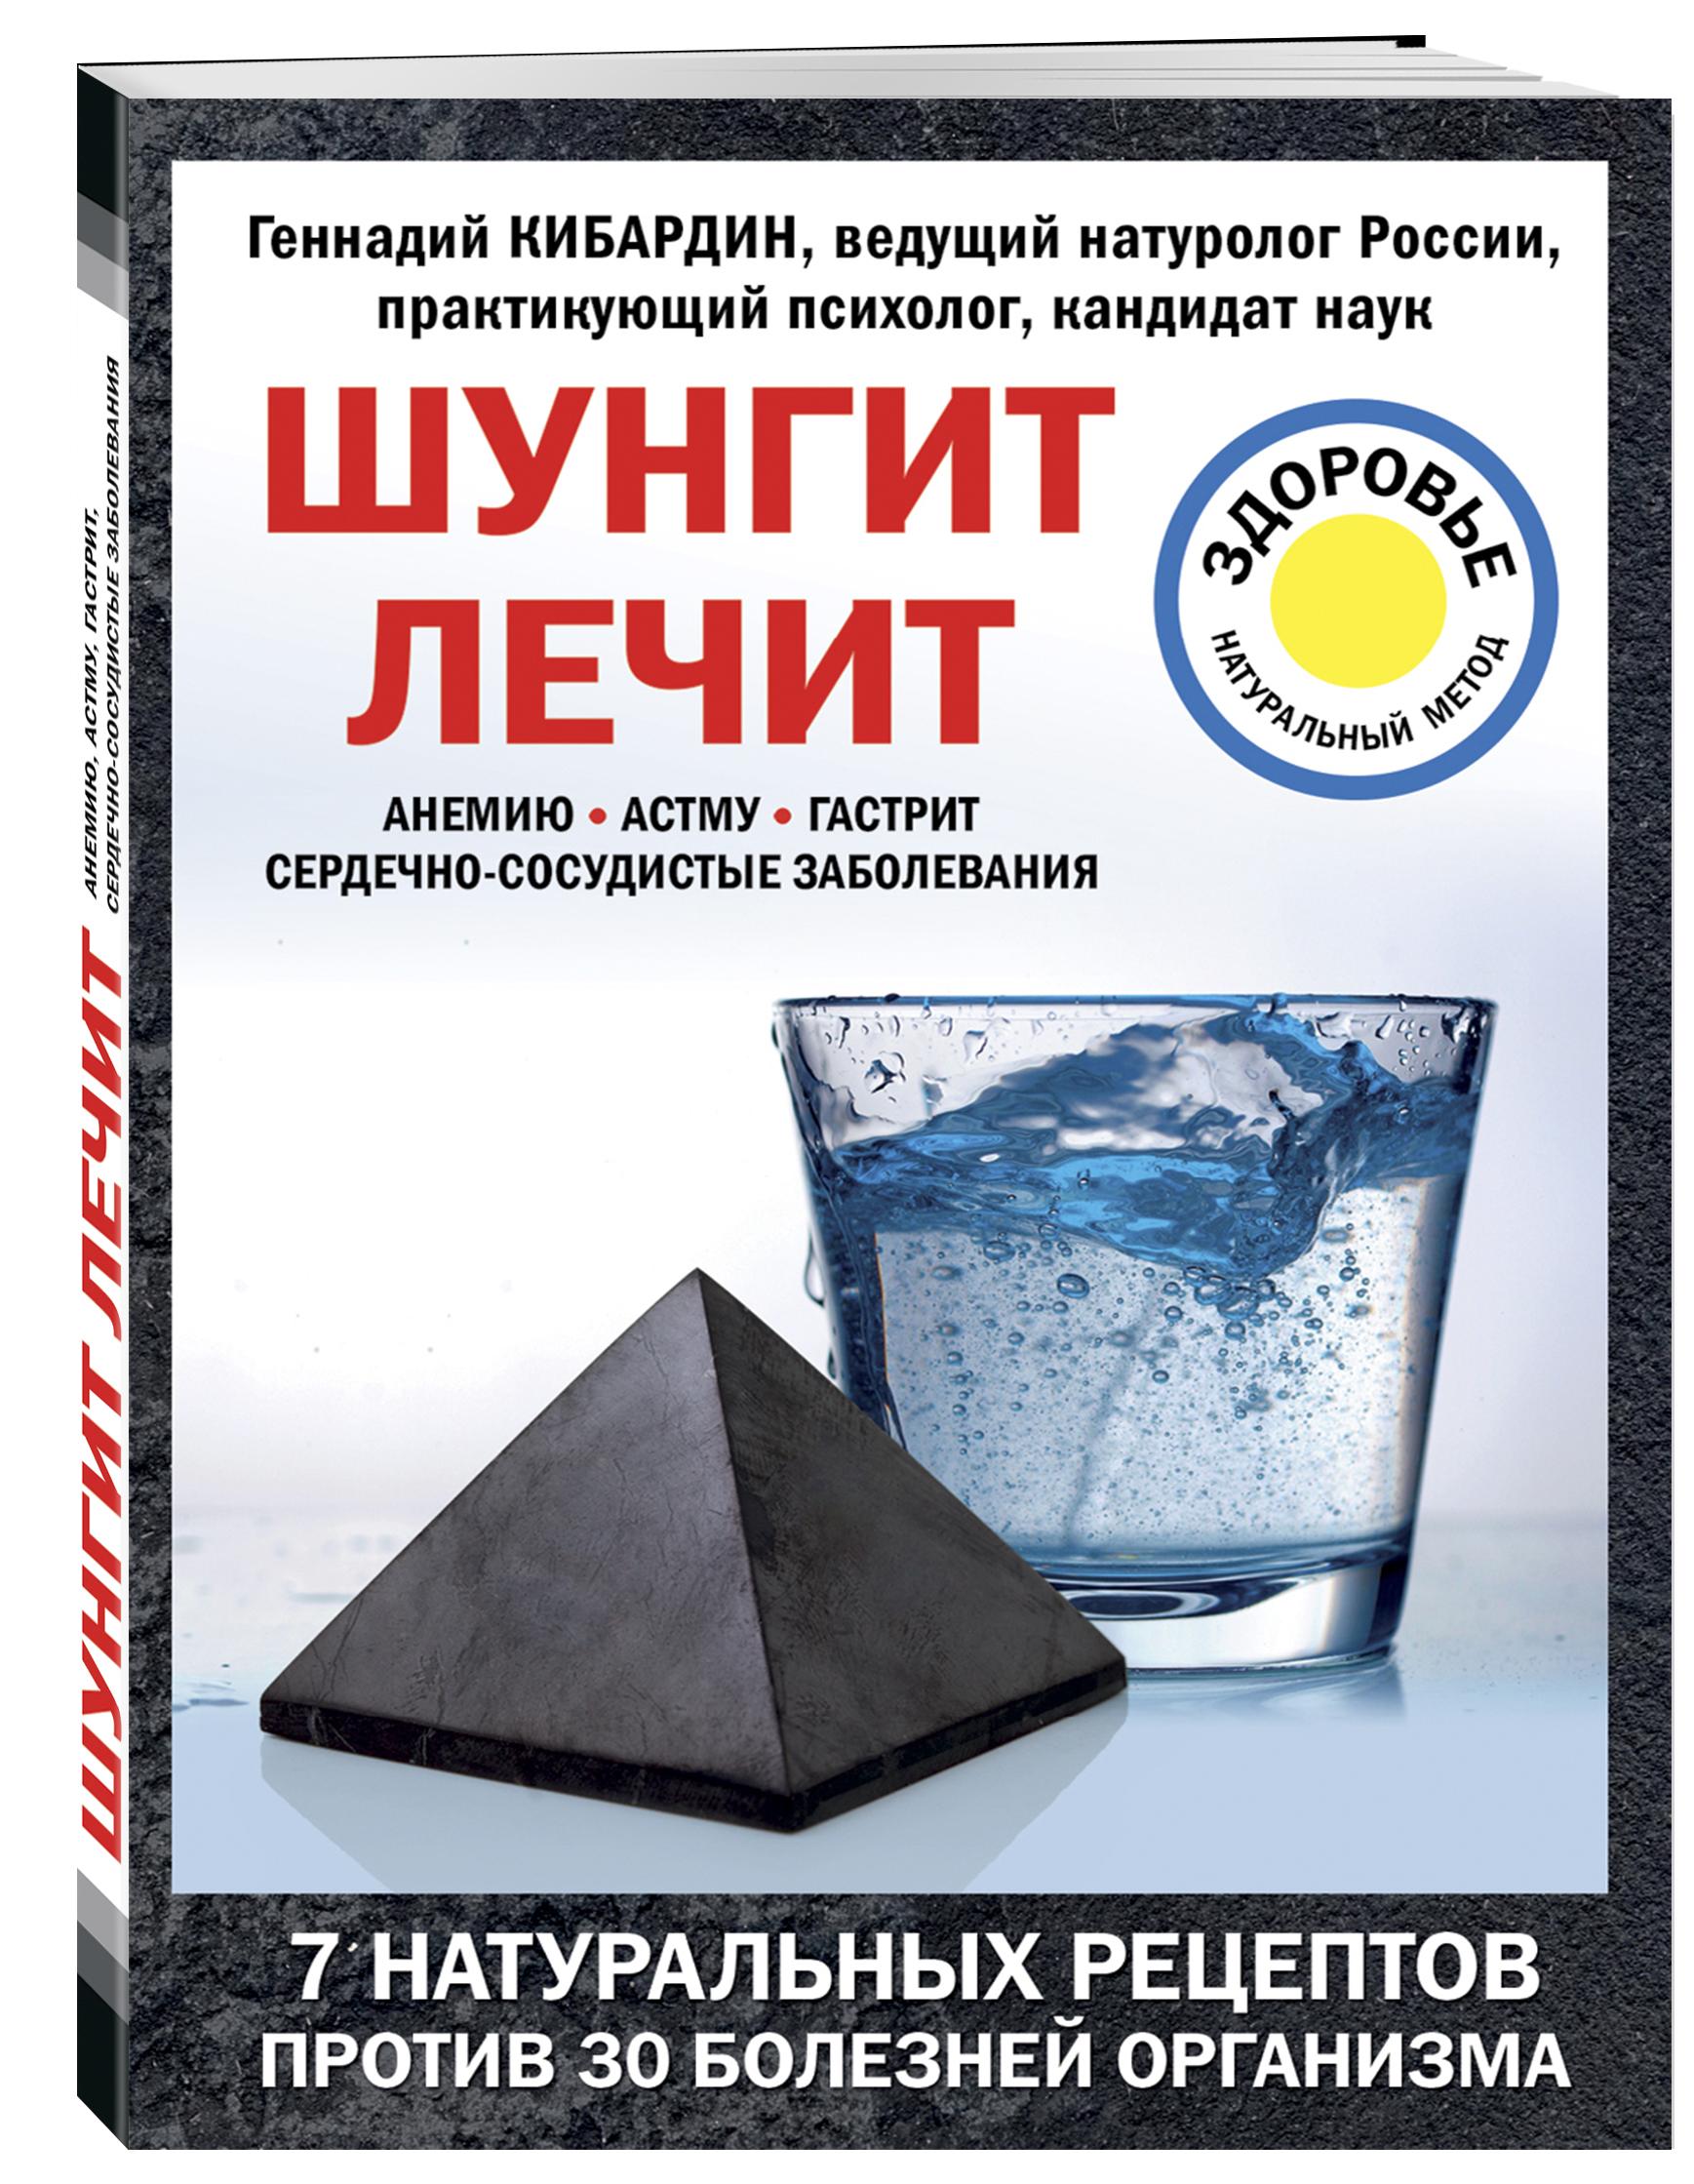 Шунгит лечит ( Кибардин Геннадий Михайлович  )